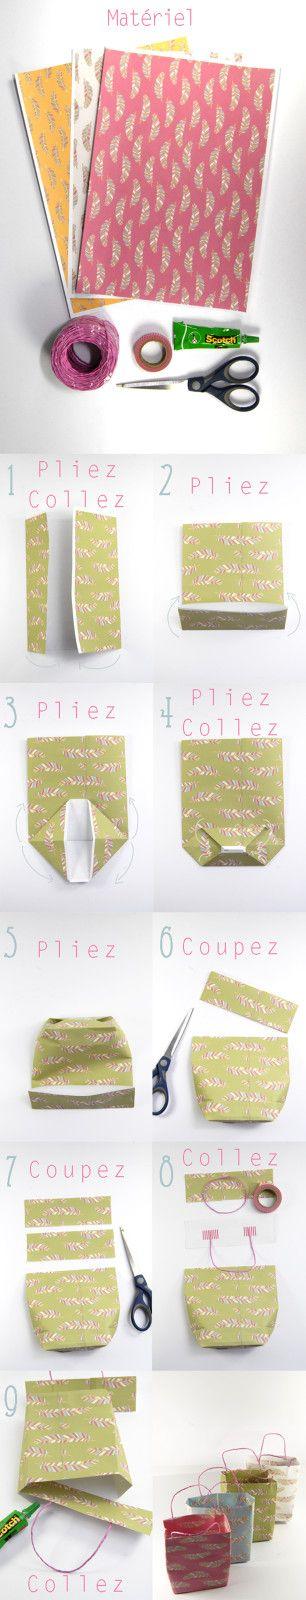 tuto comment faire des petits sacs en papier verpackungswunder pinterest geschenke. Black Bedroom Furniture Sets. Home Design Ideas